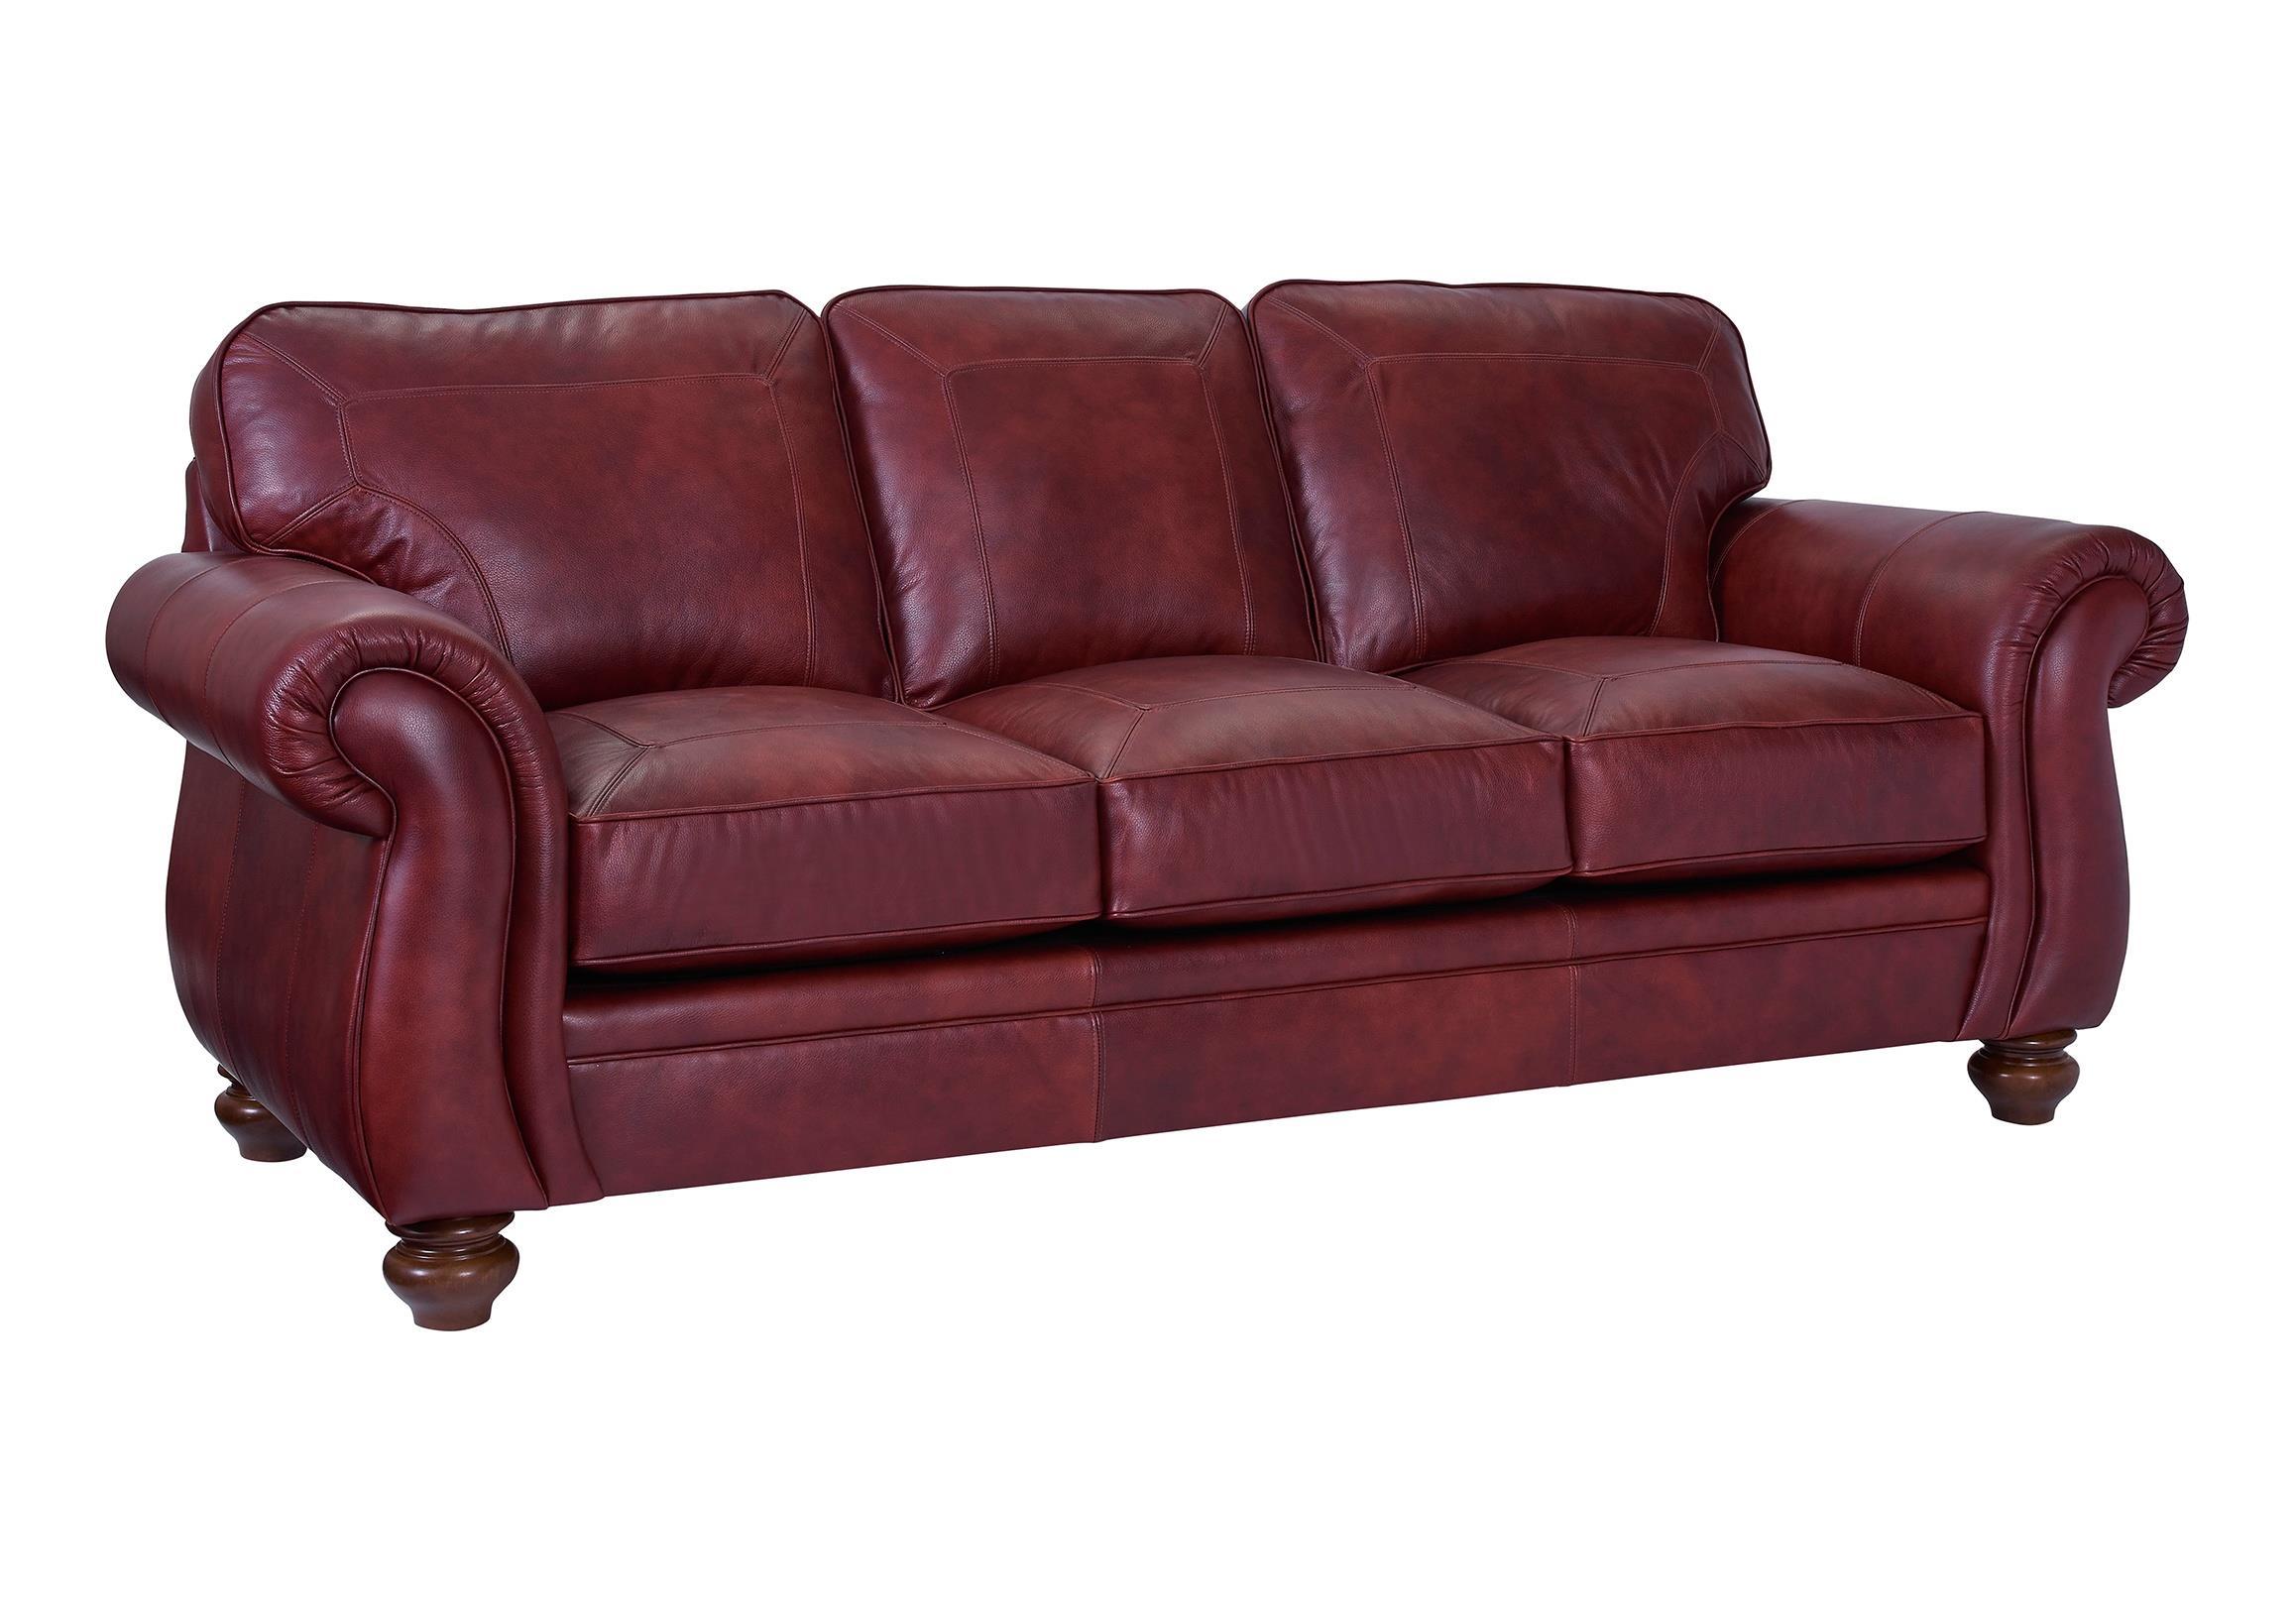 Broyhill Furniture Cassandra Traditional Queen IREST Sleeper - Item Number: L3688-7M-0063-69